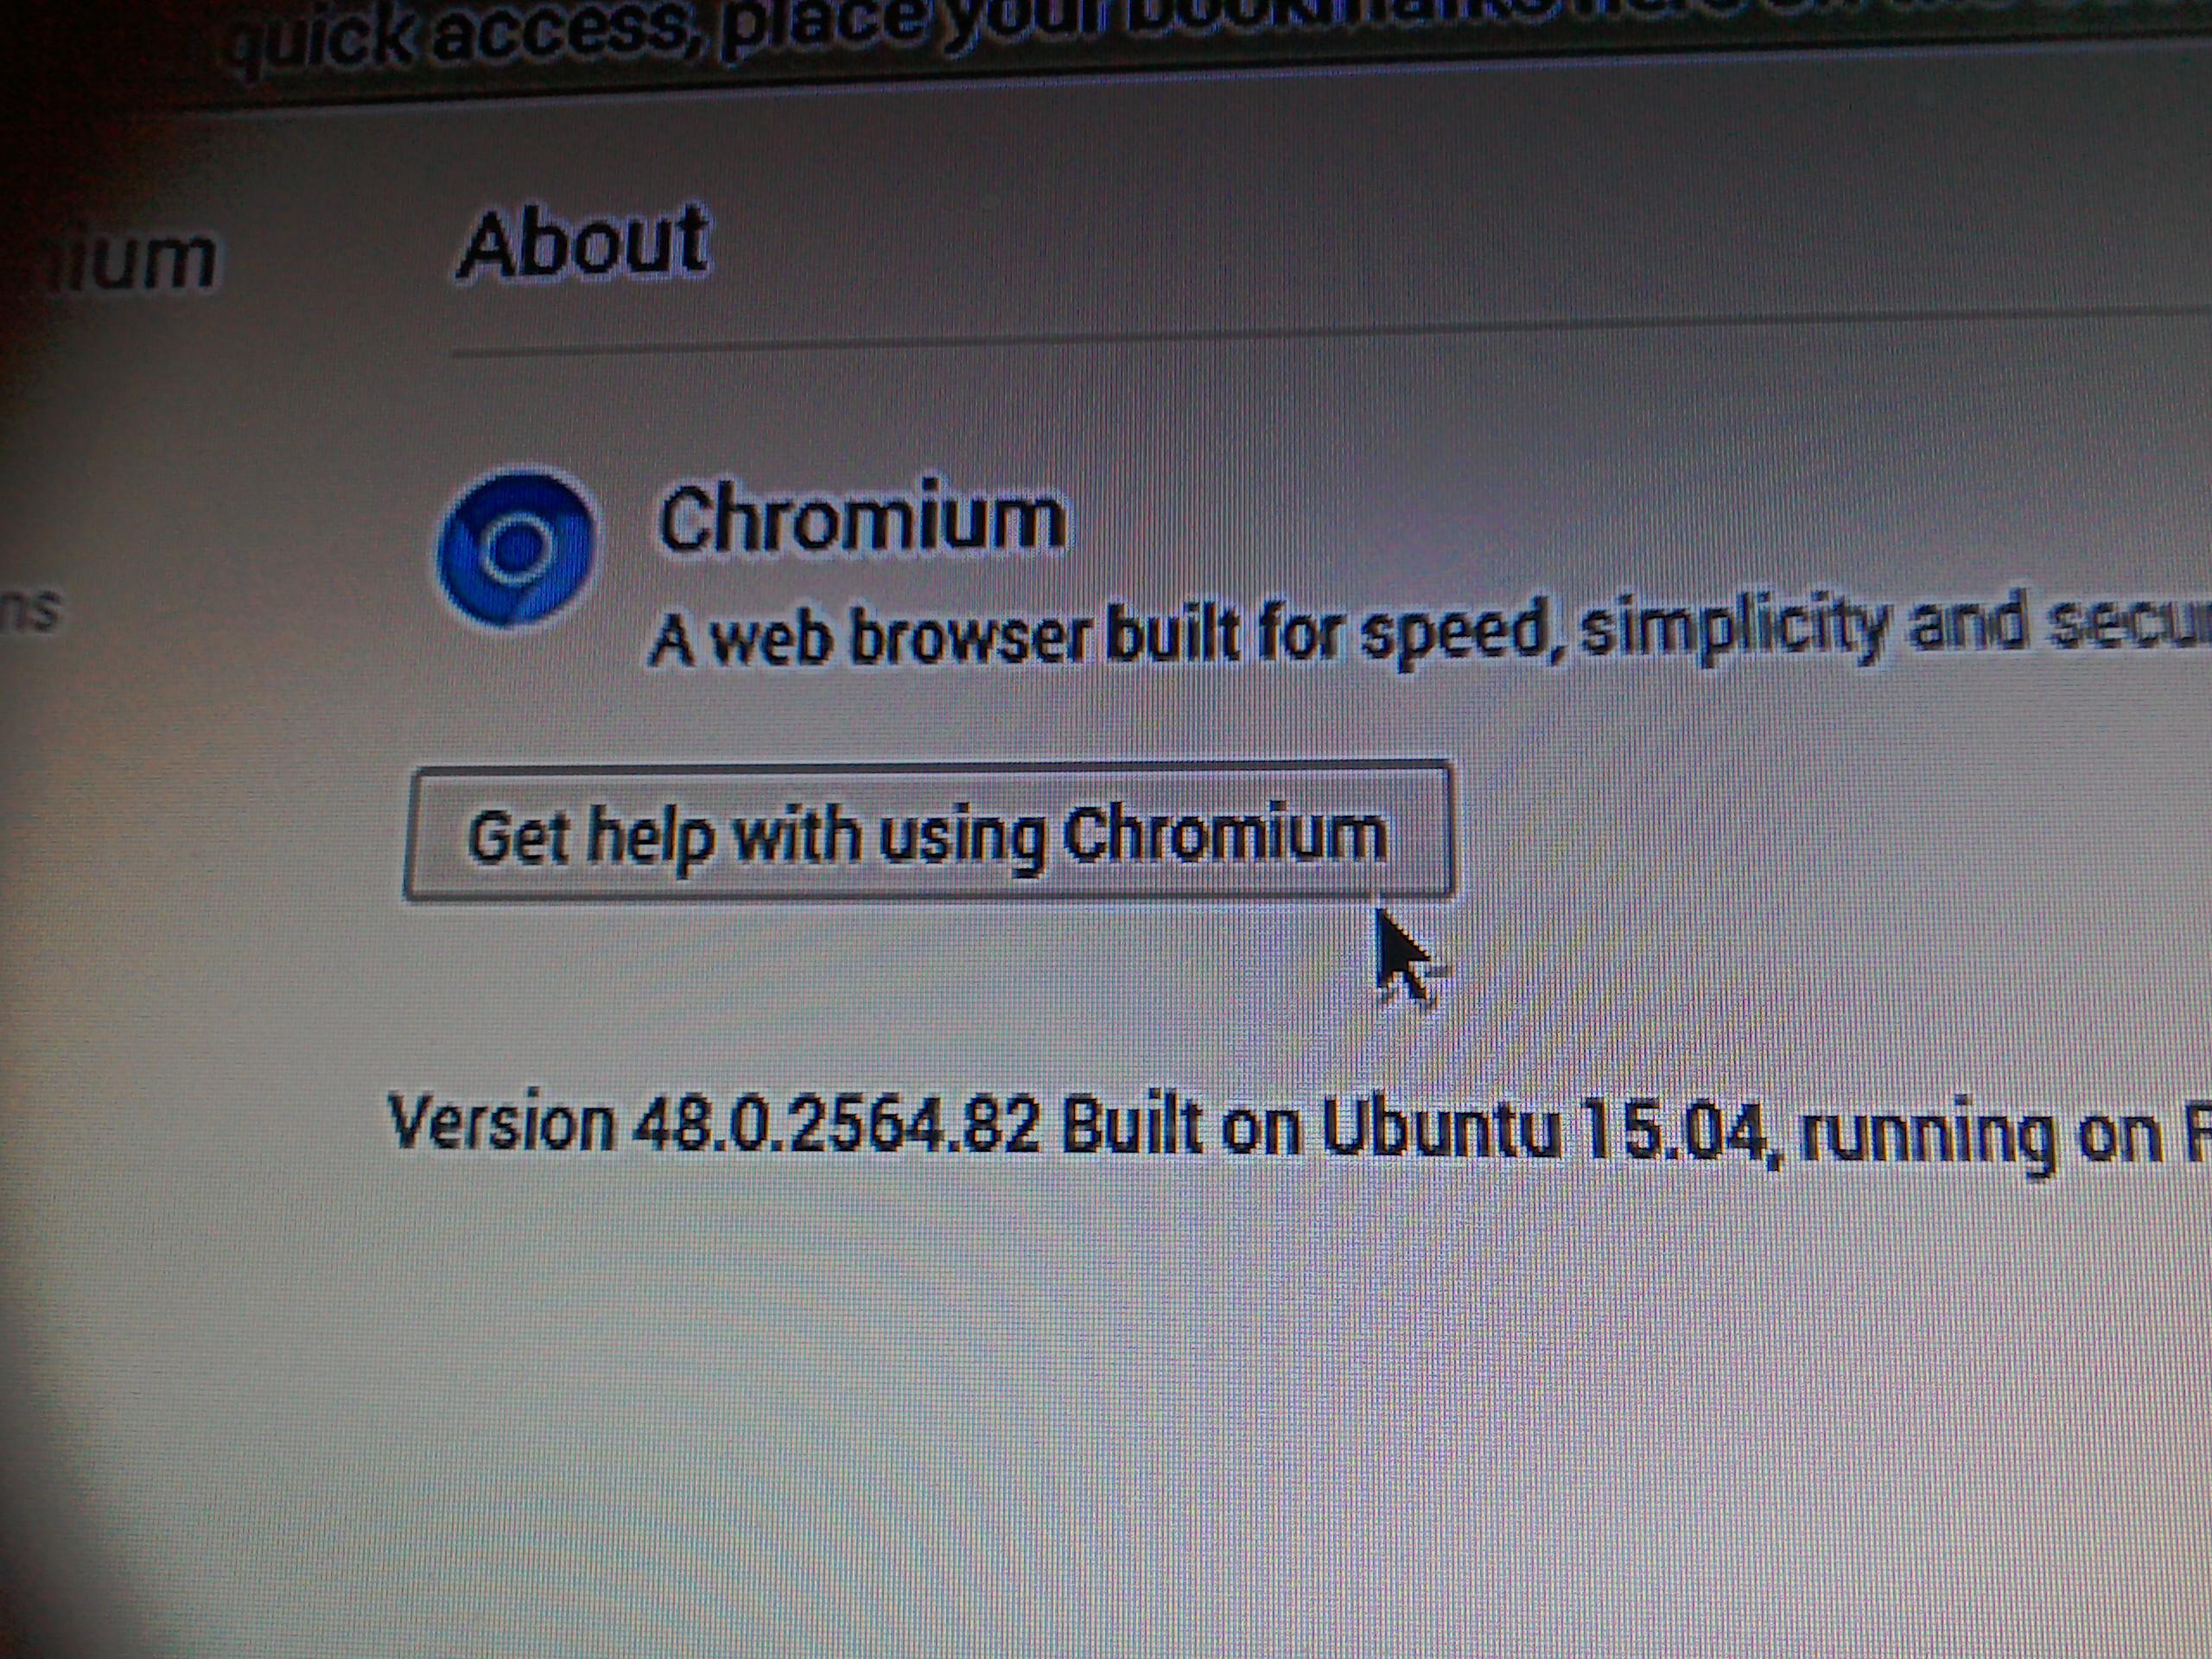 How to install Chromium on Raspbian Jessie Raspberry Pi 2 and 3